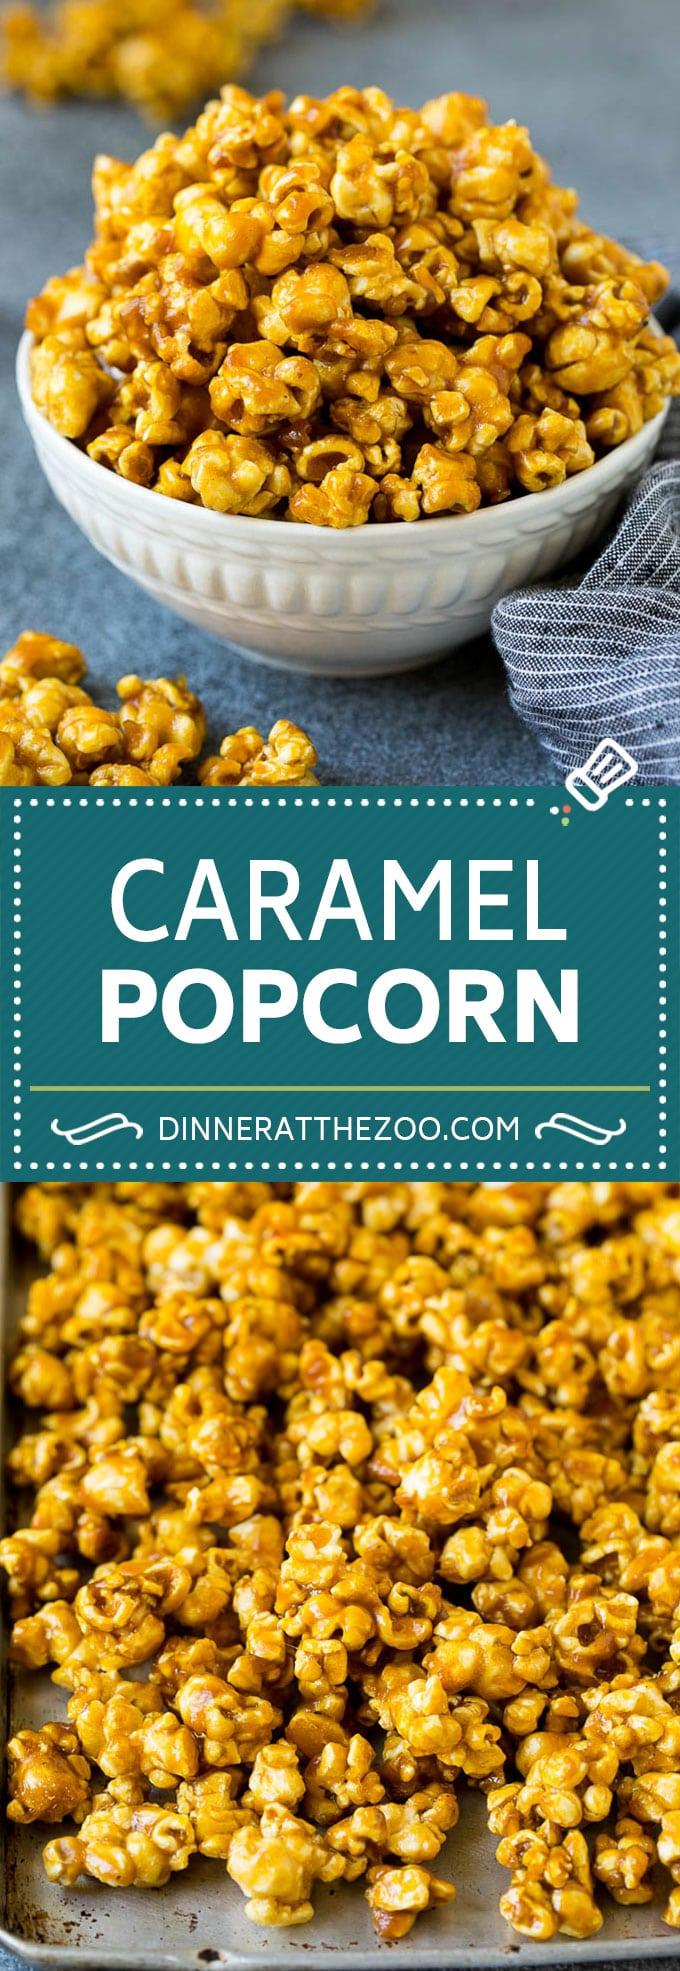 Caramel Popcorn Dinner At The Zoo